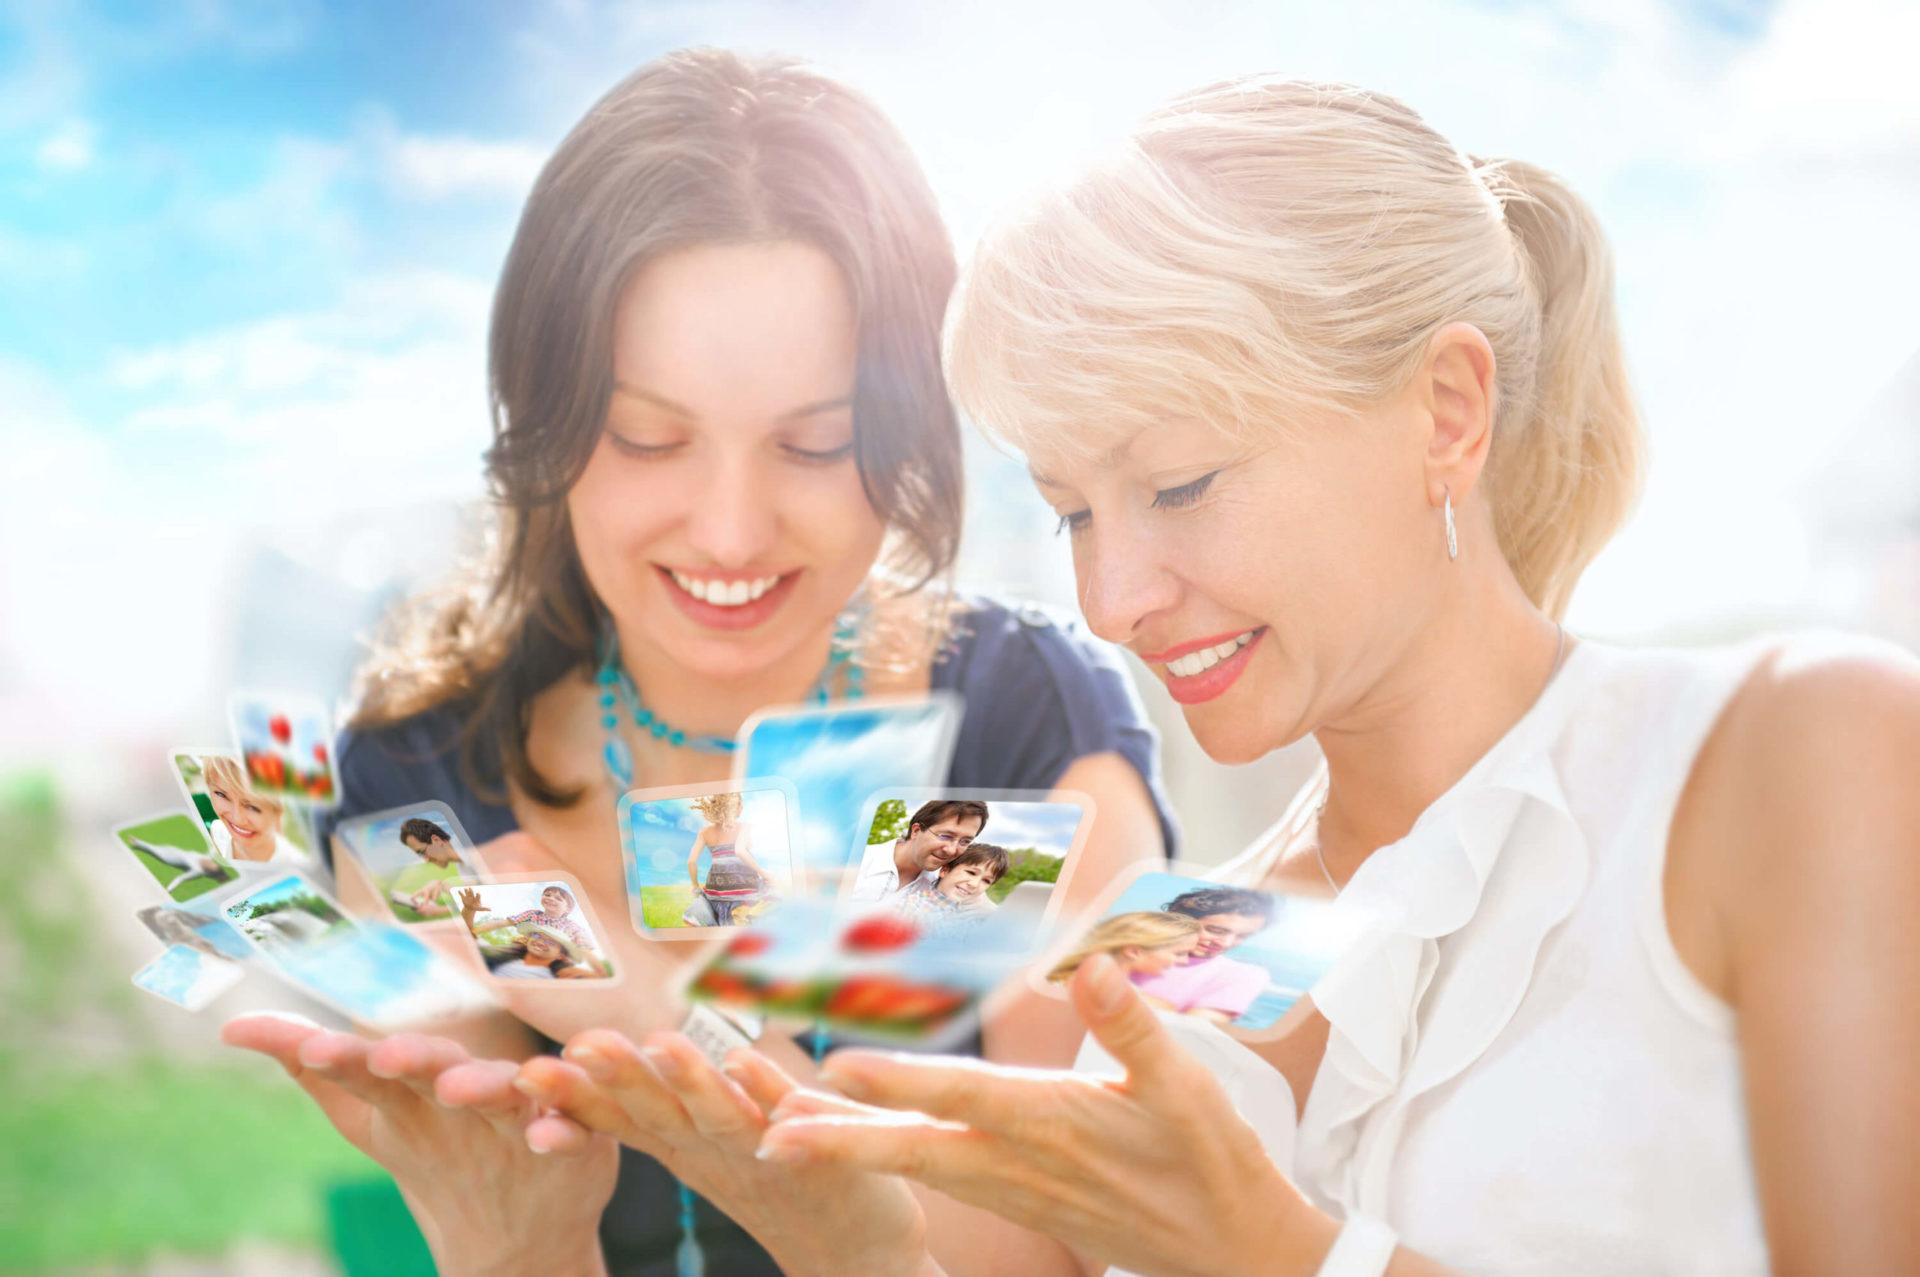 Two women looking at Social Media photos